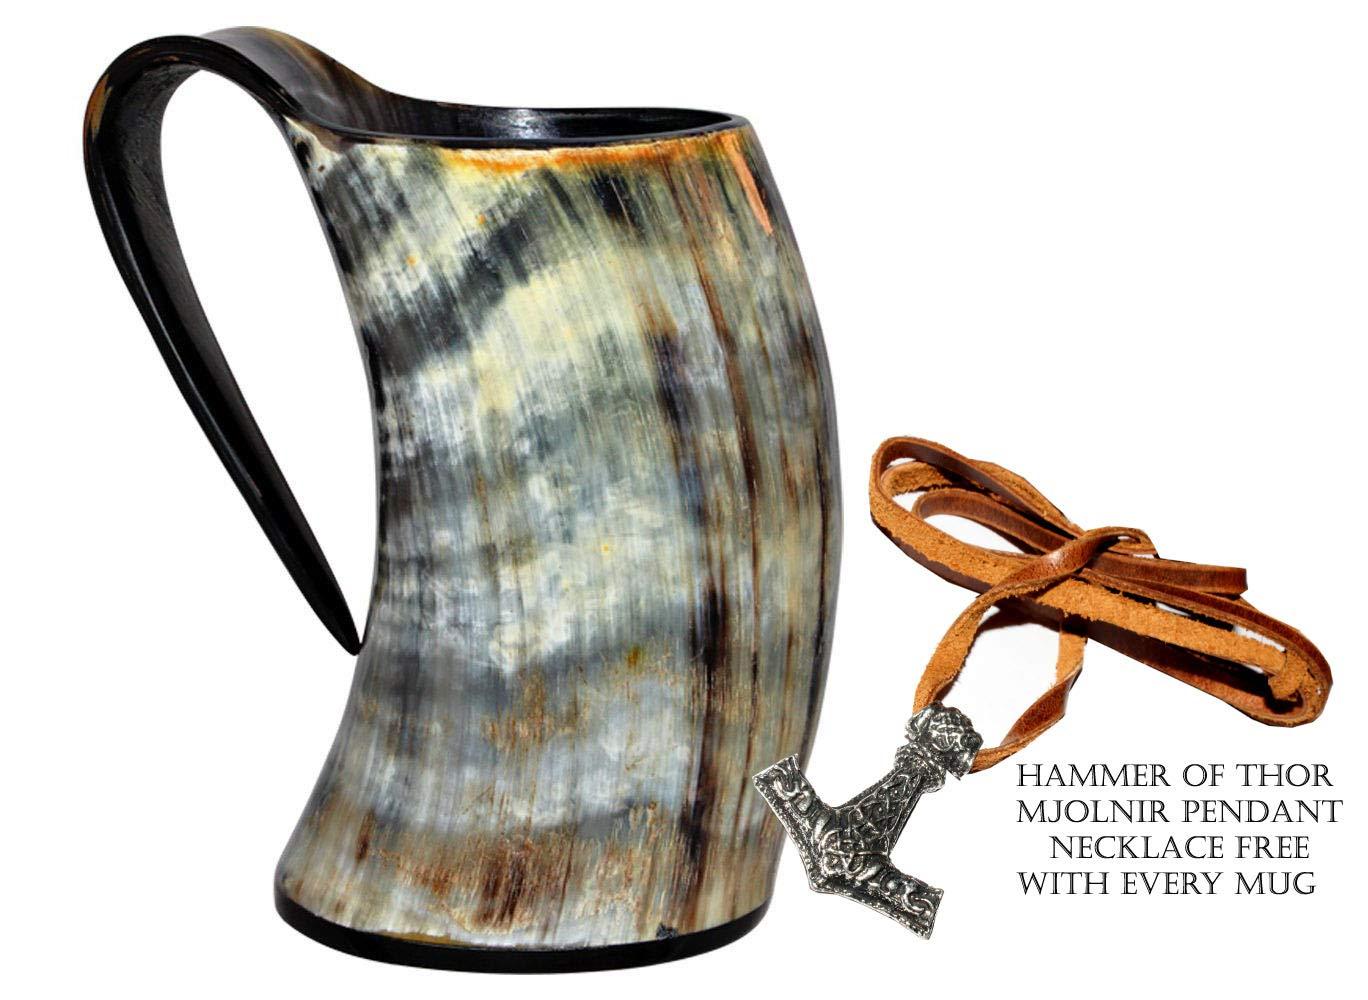 16oznt Vikings Valhallas Viking Cup Drinking Horn Tankard Authentic Medieval Inspired drinking Mug